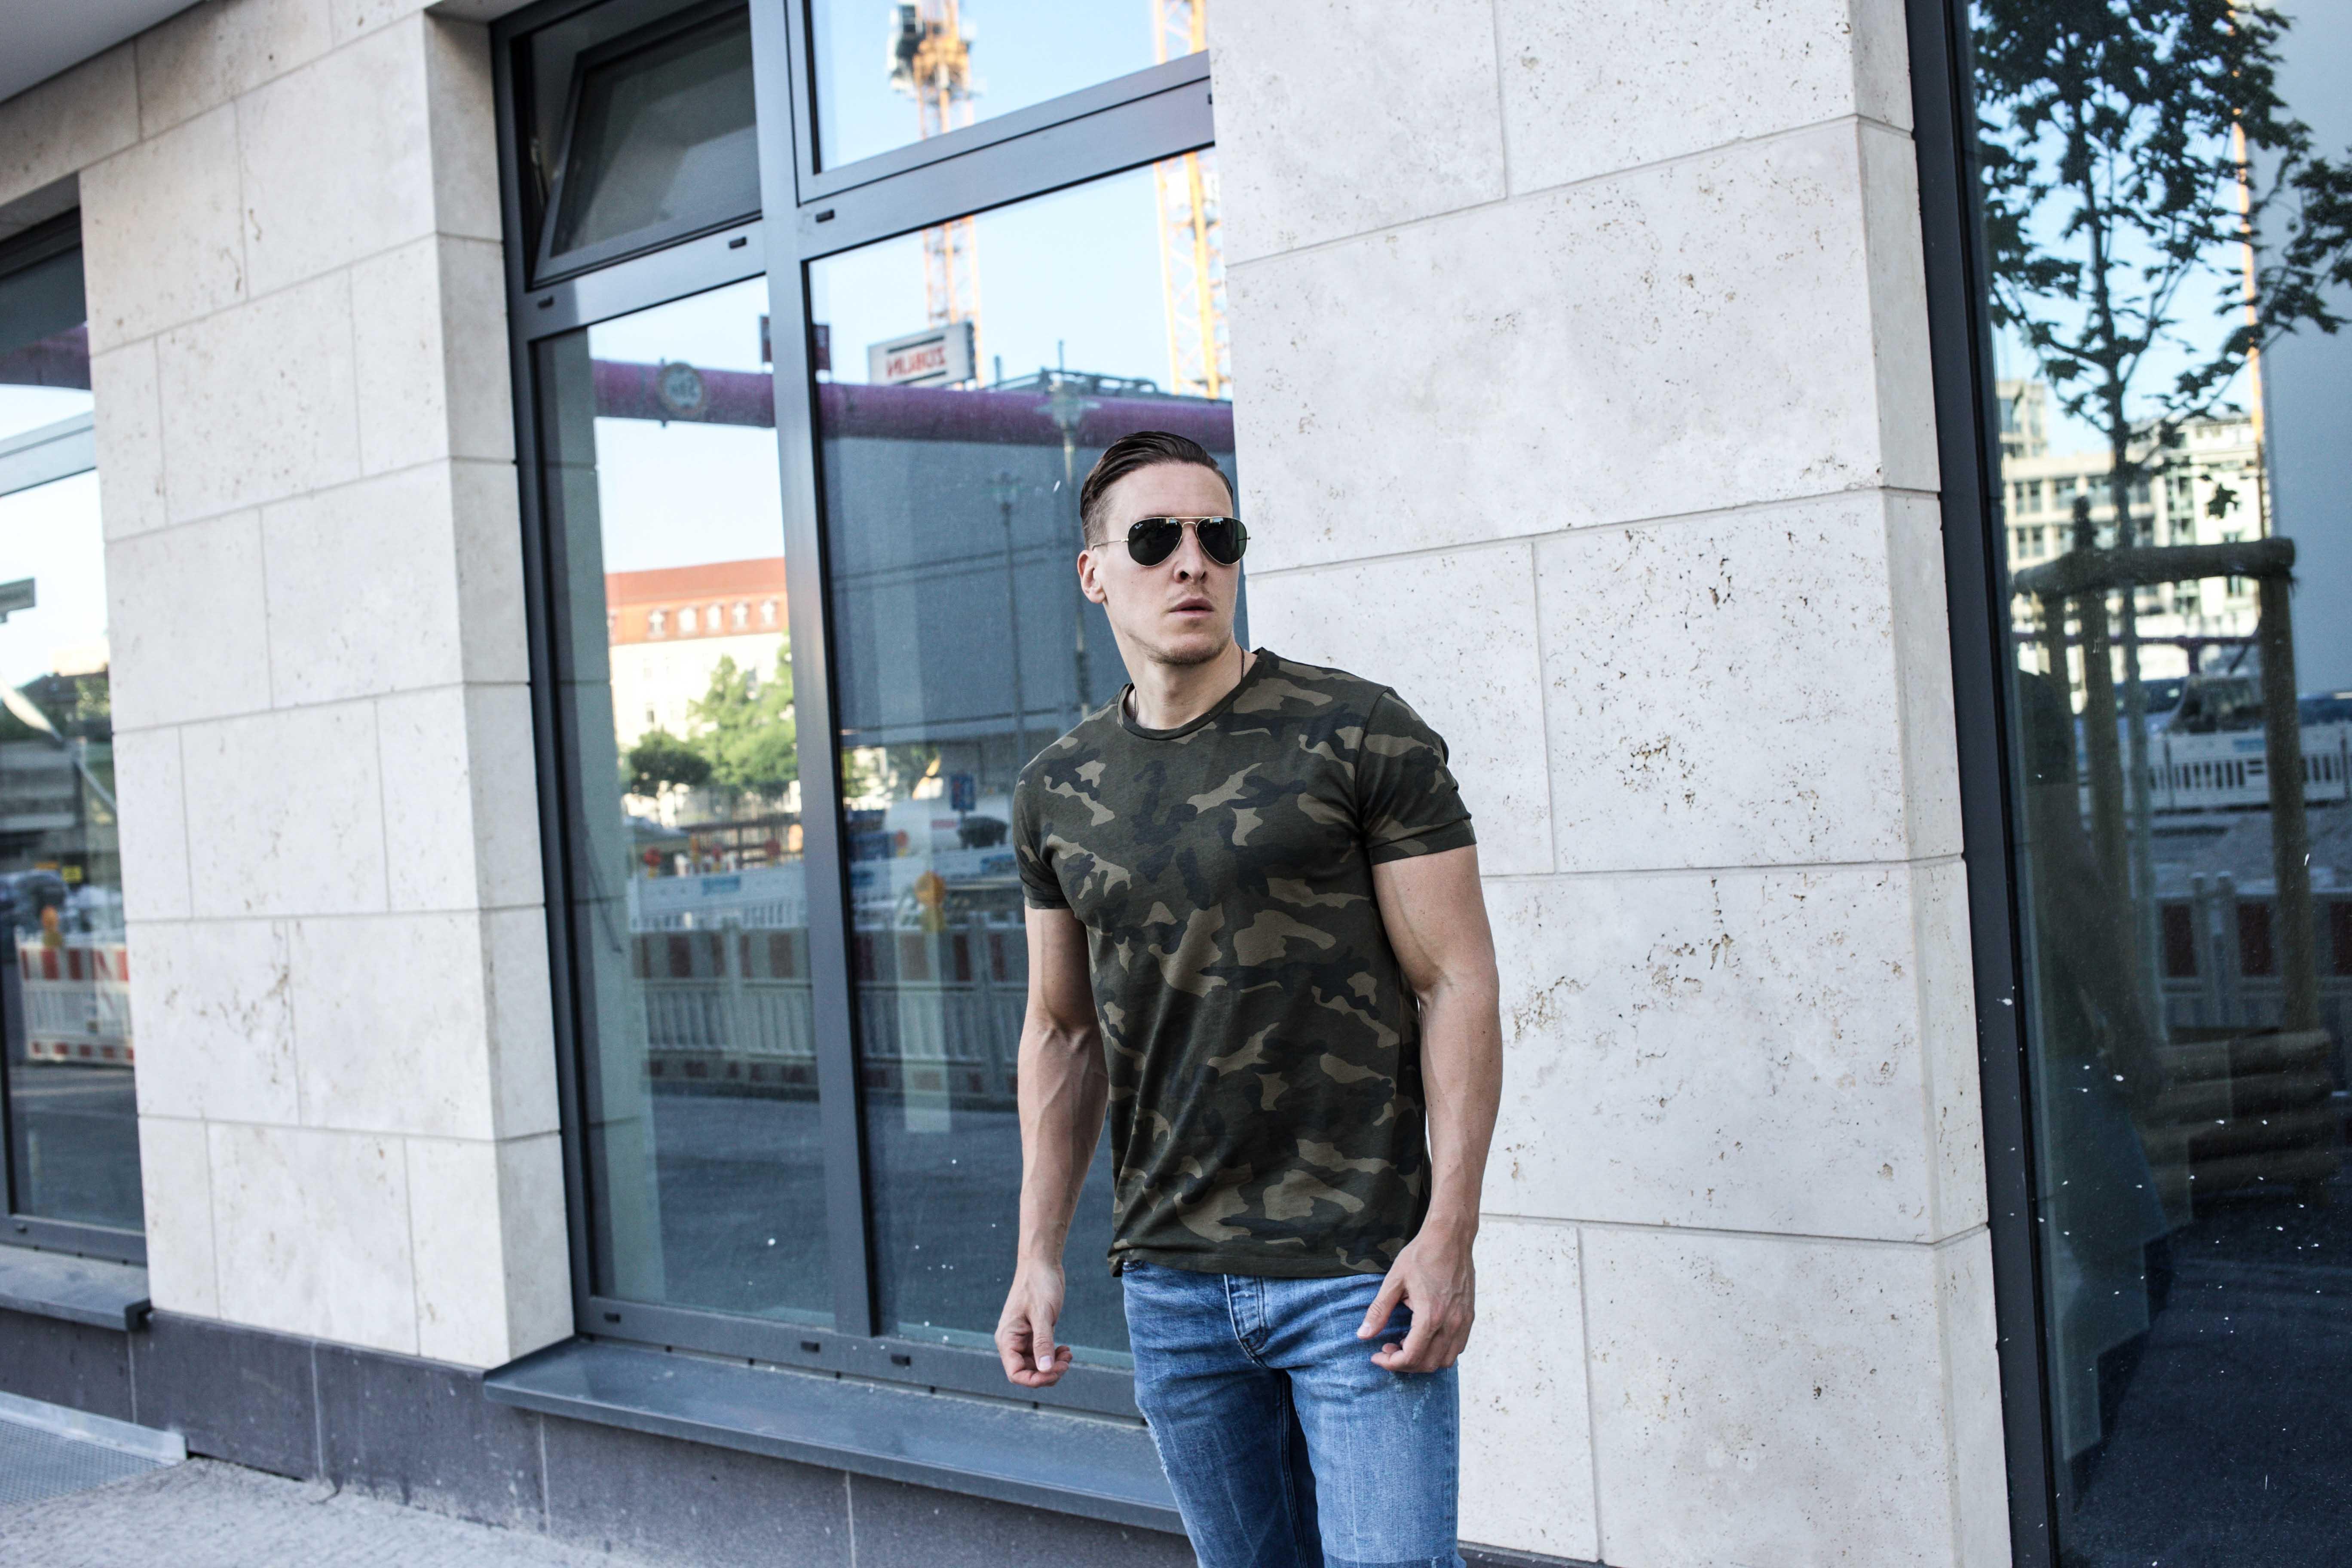 camouflage-braun-erdtöne-boots-ripped-jeans-männer-lifestyle-modeblog_6856